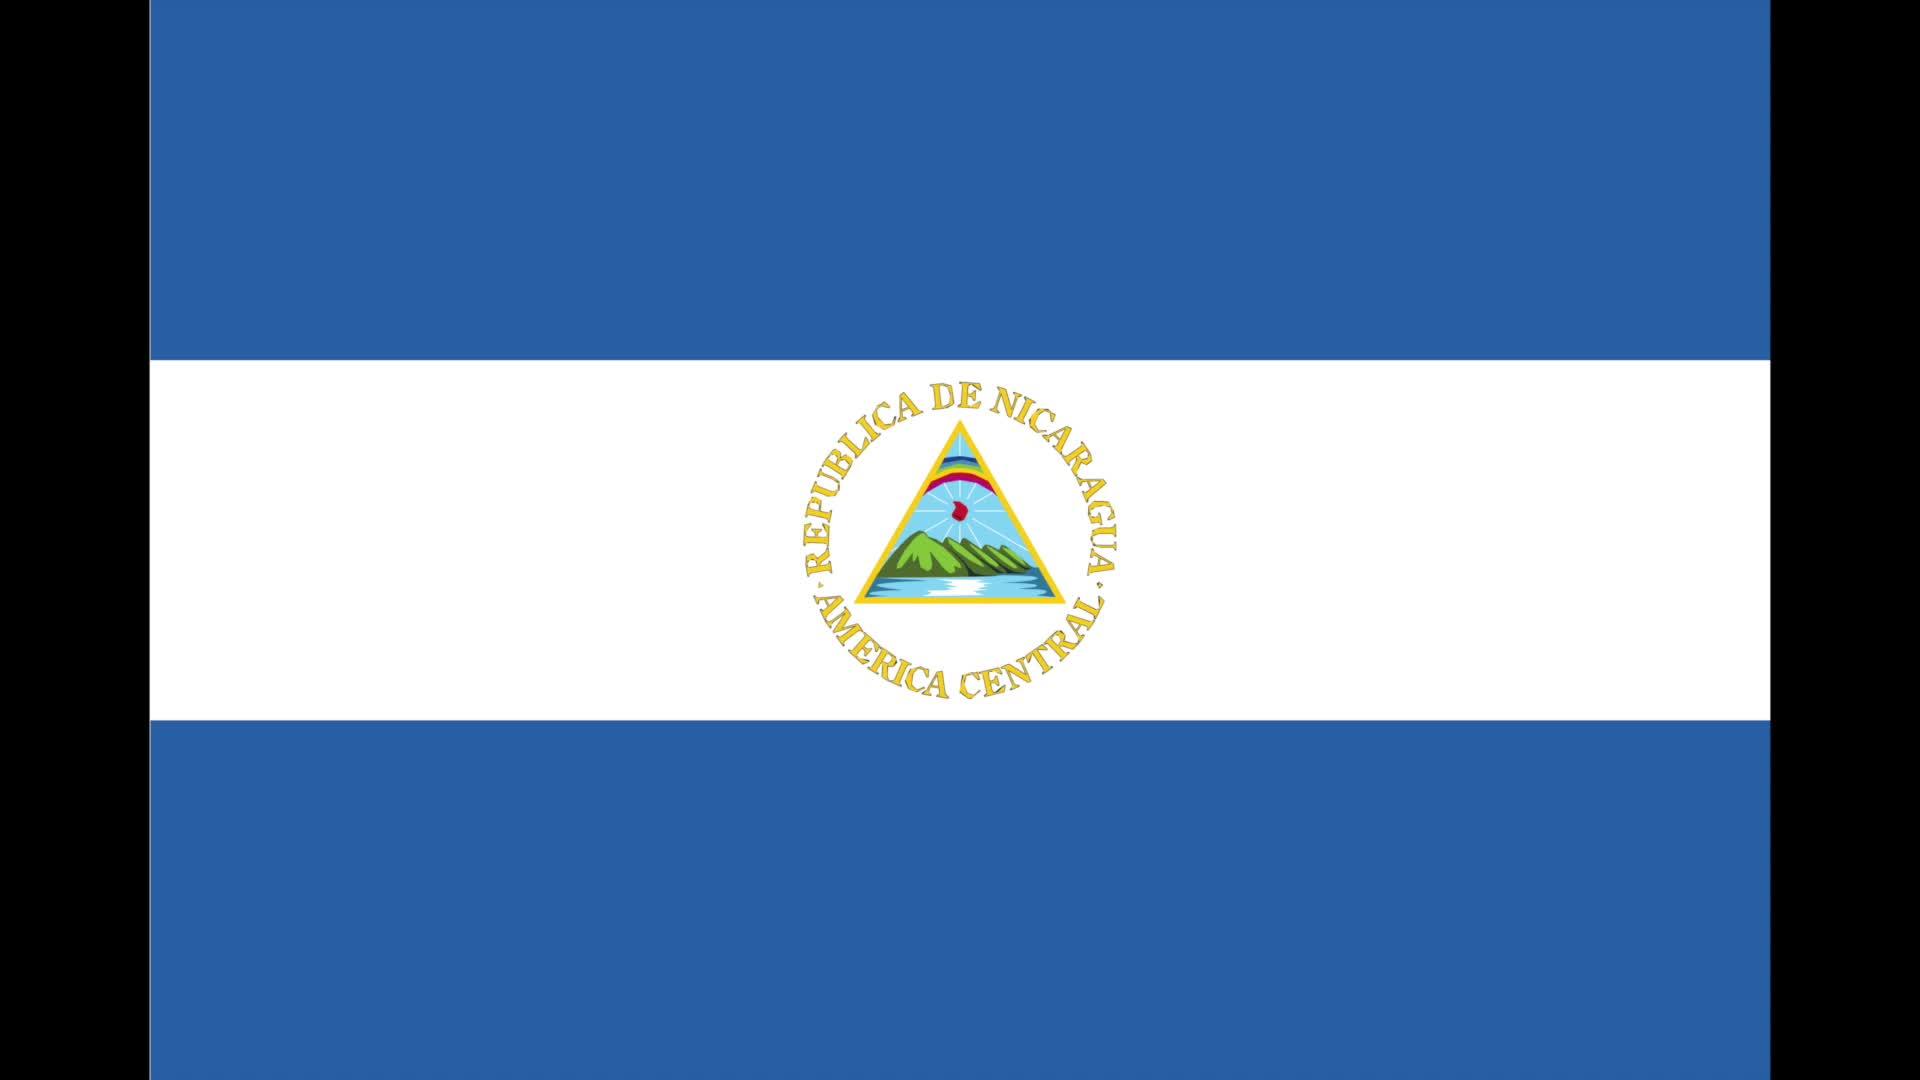 Alberto Monnar - Nicaragua National Anthem / Himno Nacional De Nicaragua